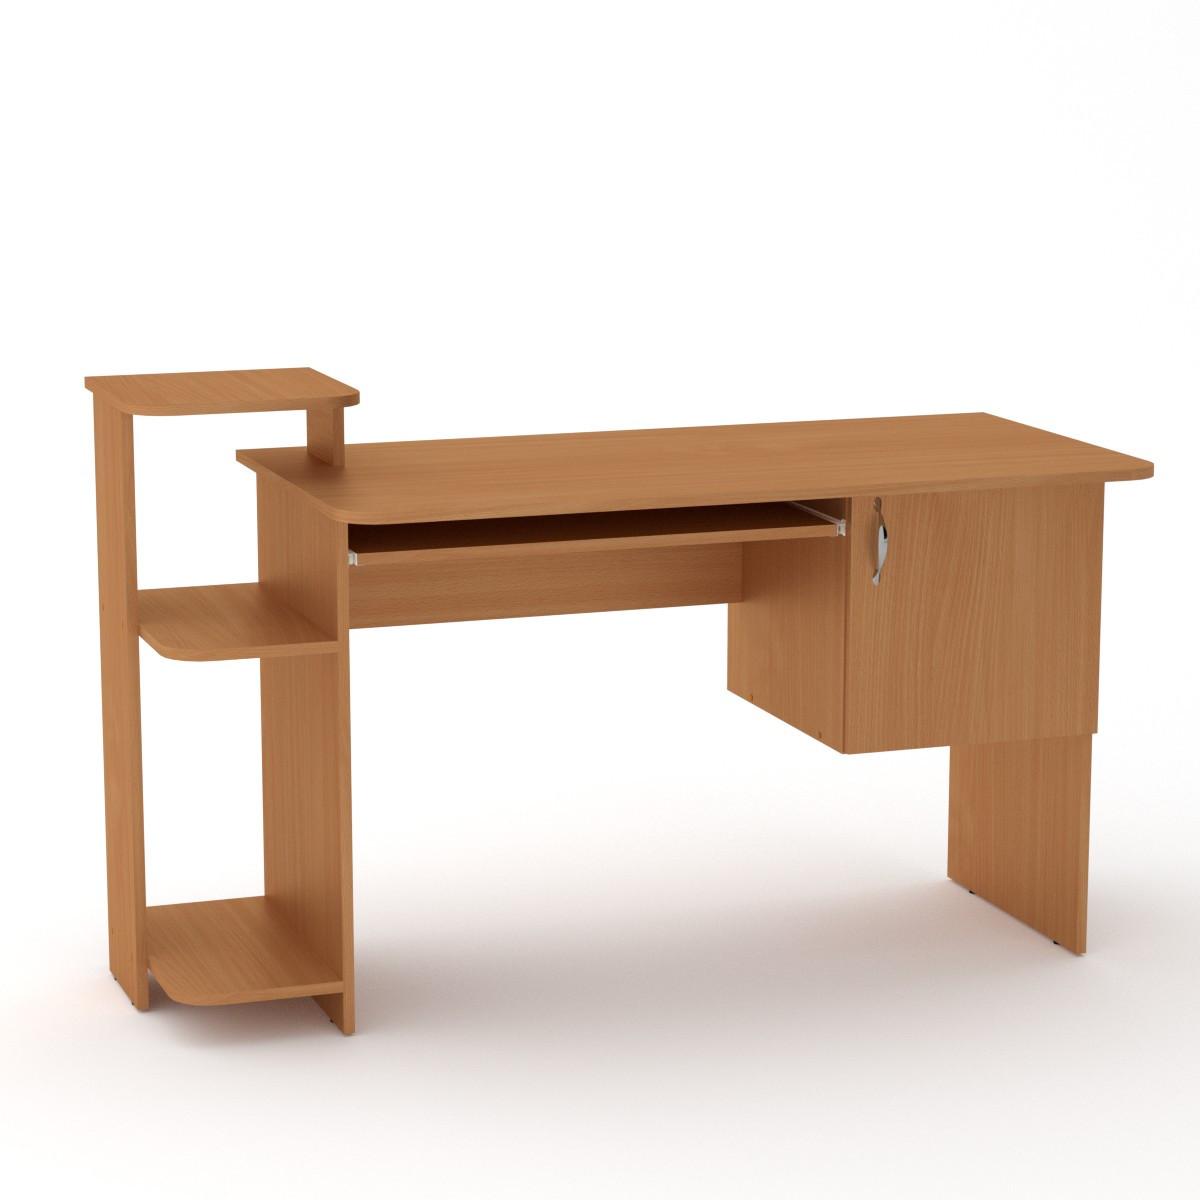 Стол компьютерный СКМ-3 бук Компанит (142х60х87 см)